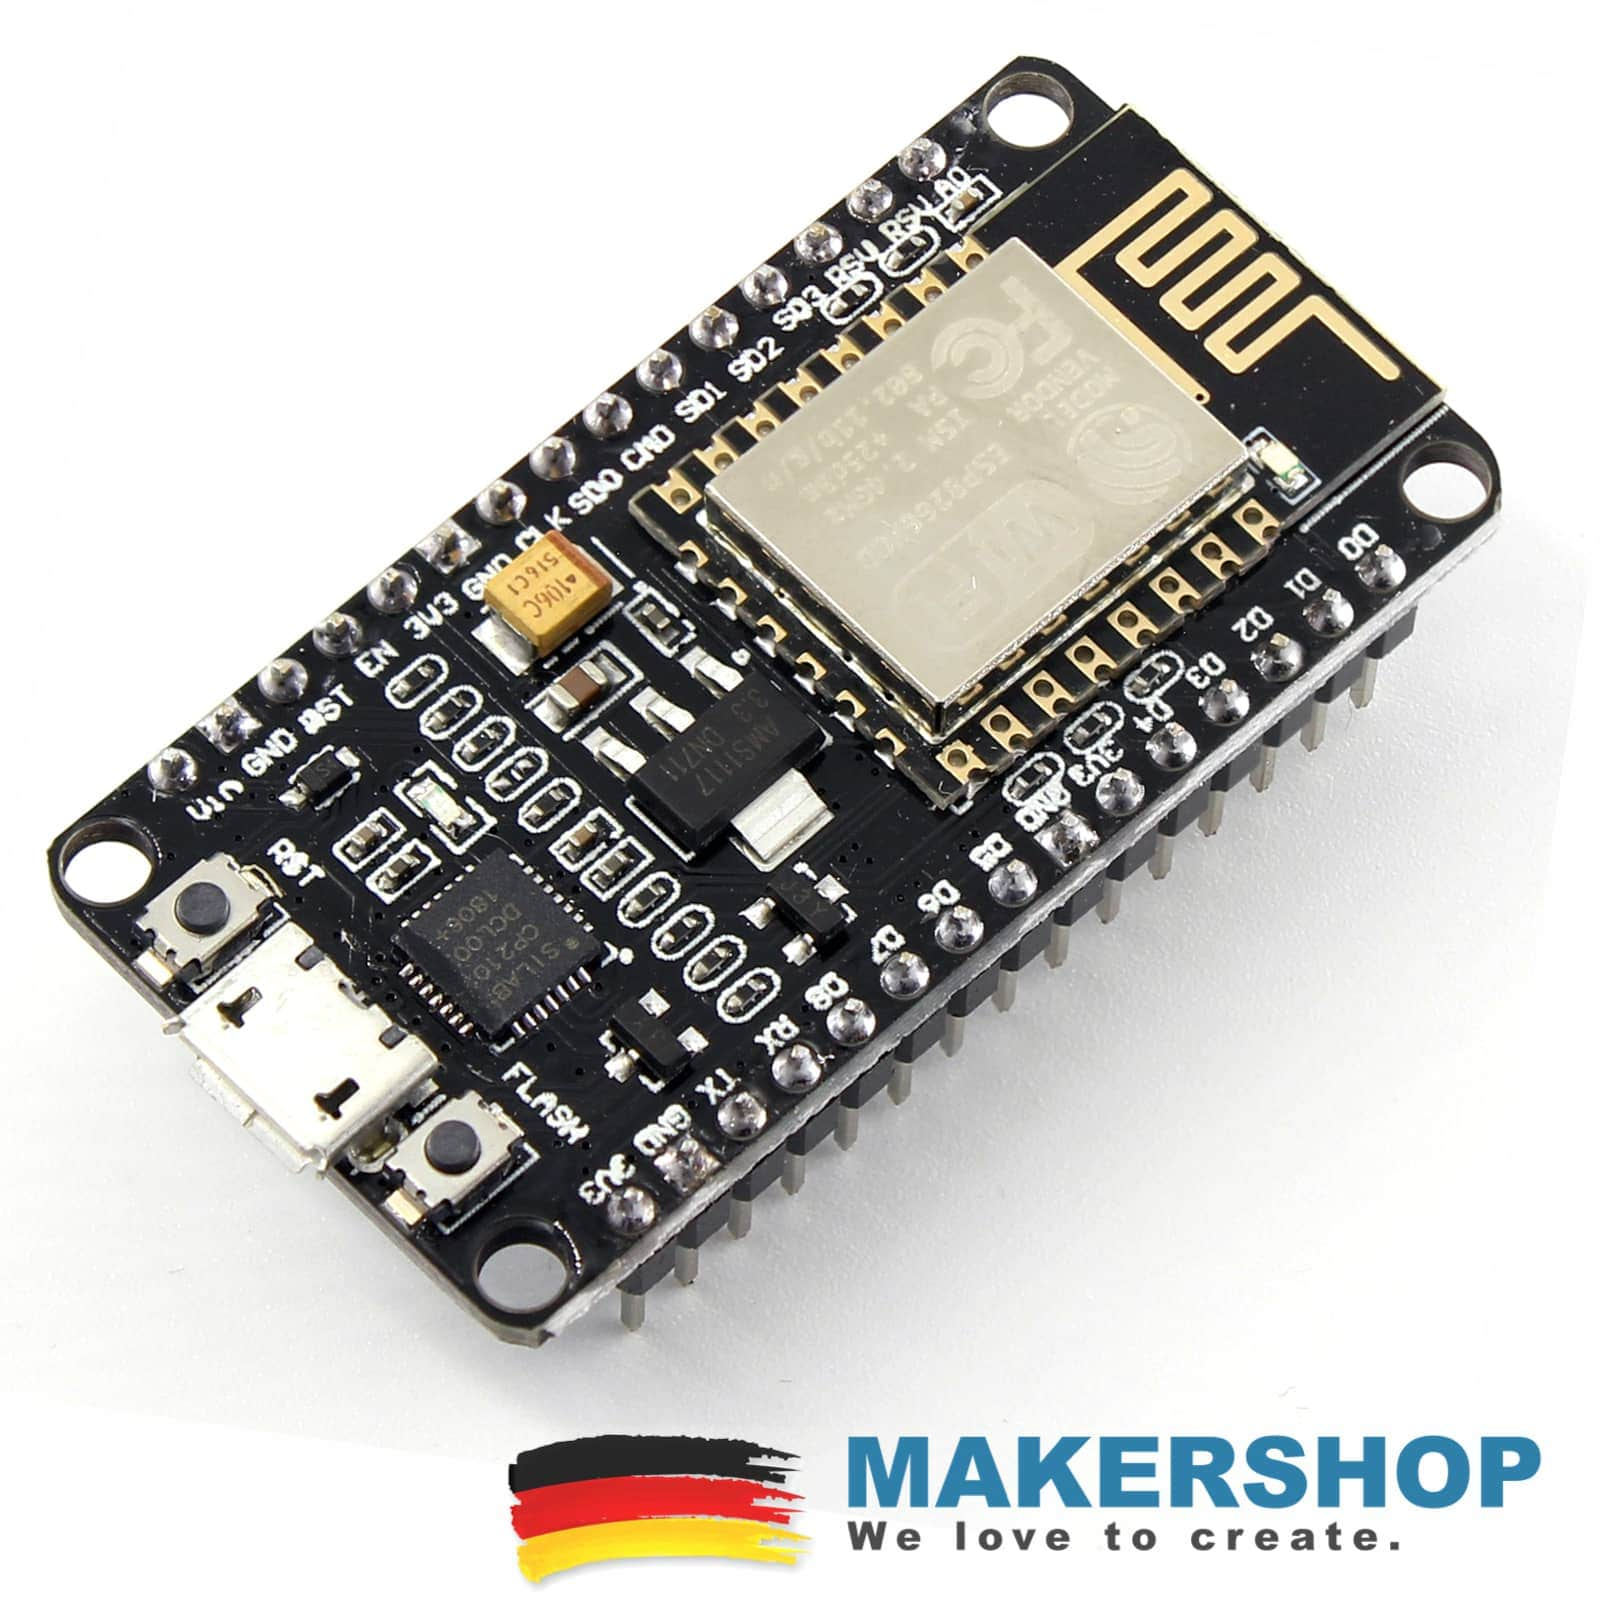 NodeMCU v3 2 - ESP8266 Dev Kit WIFI Lolin Amica CP2102 v2 Arduino IOT